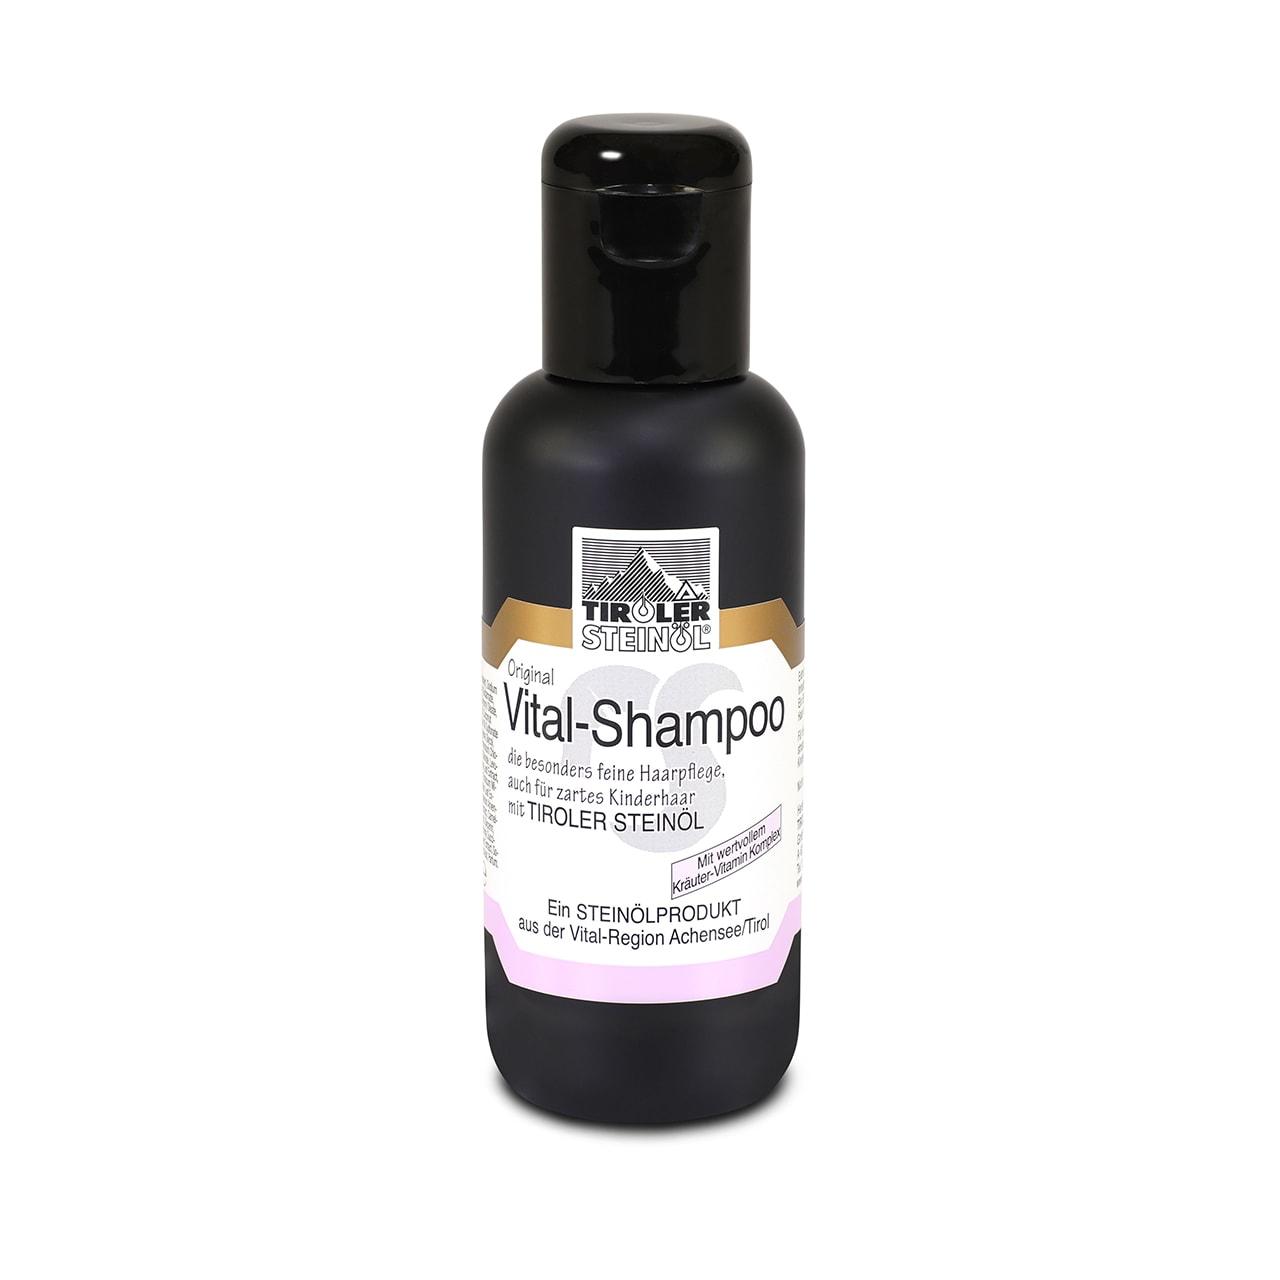 Neu: Vital-Shampoo mit Tiroler Steinöl